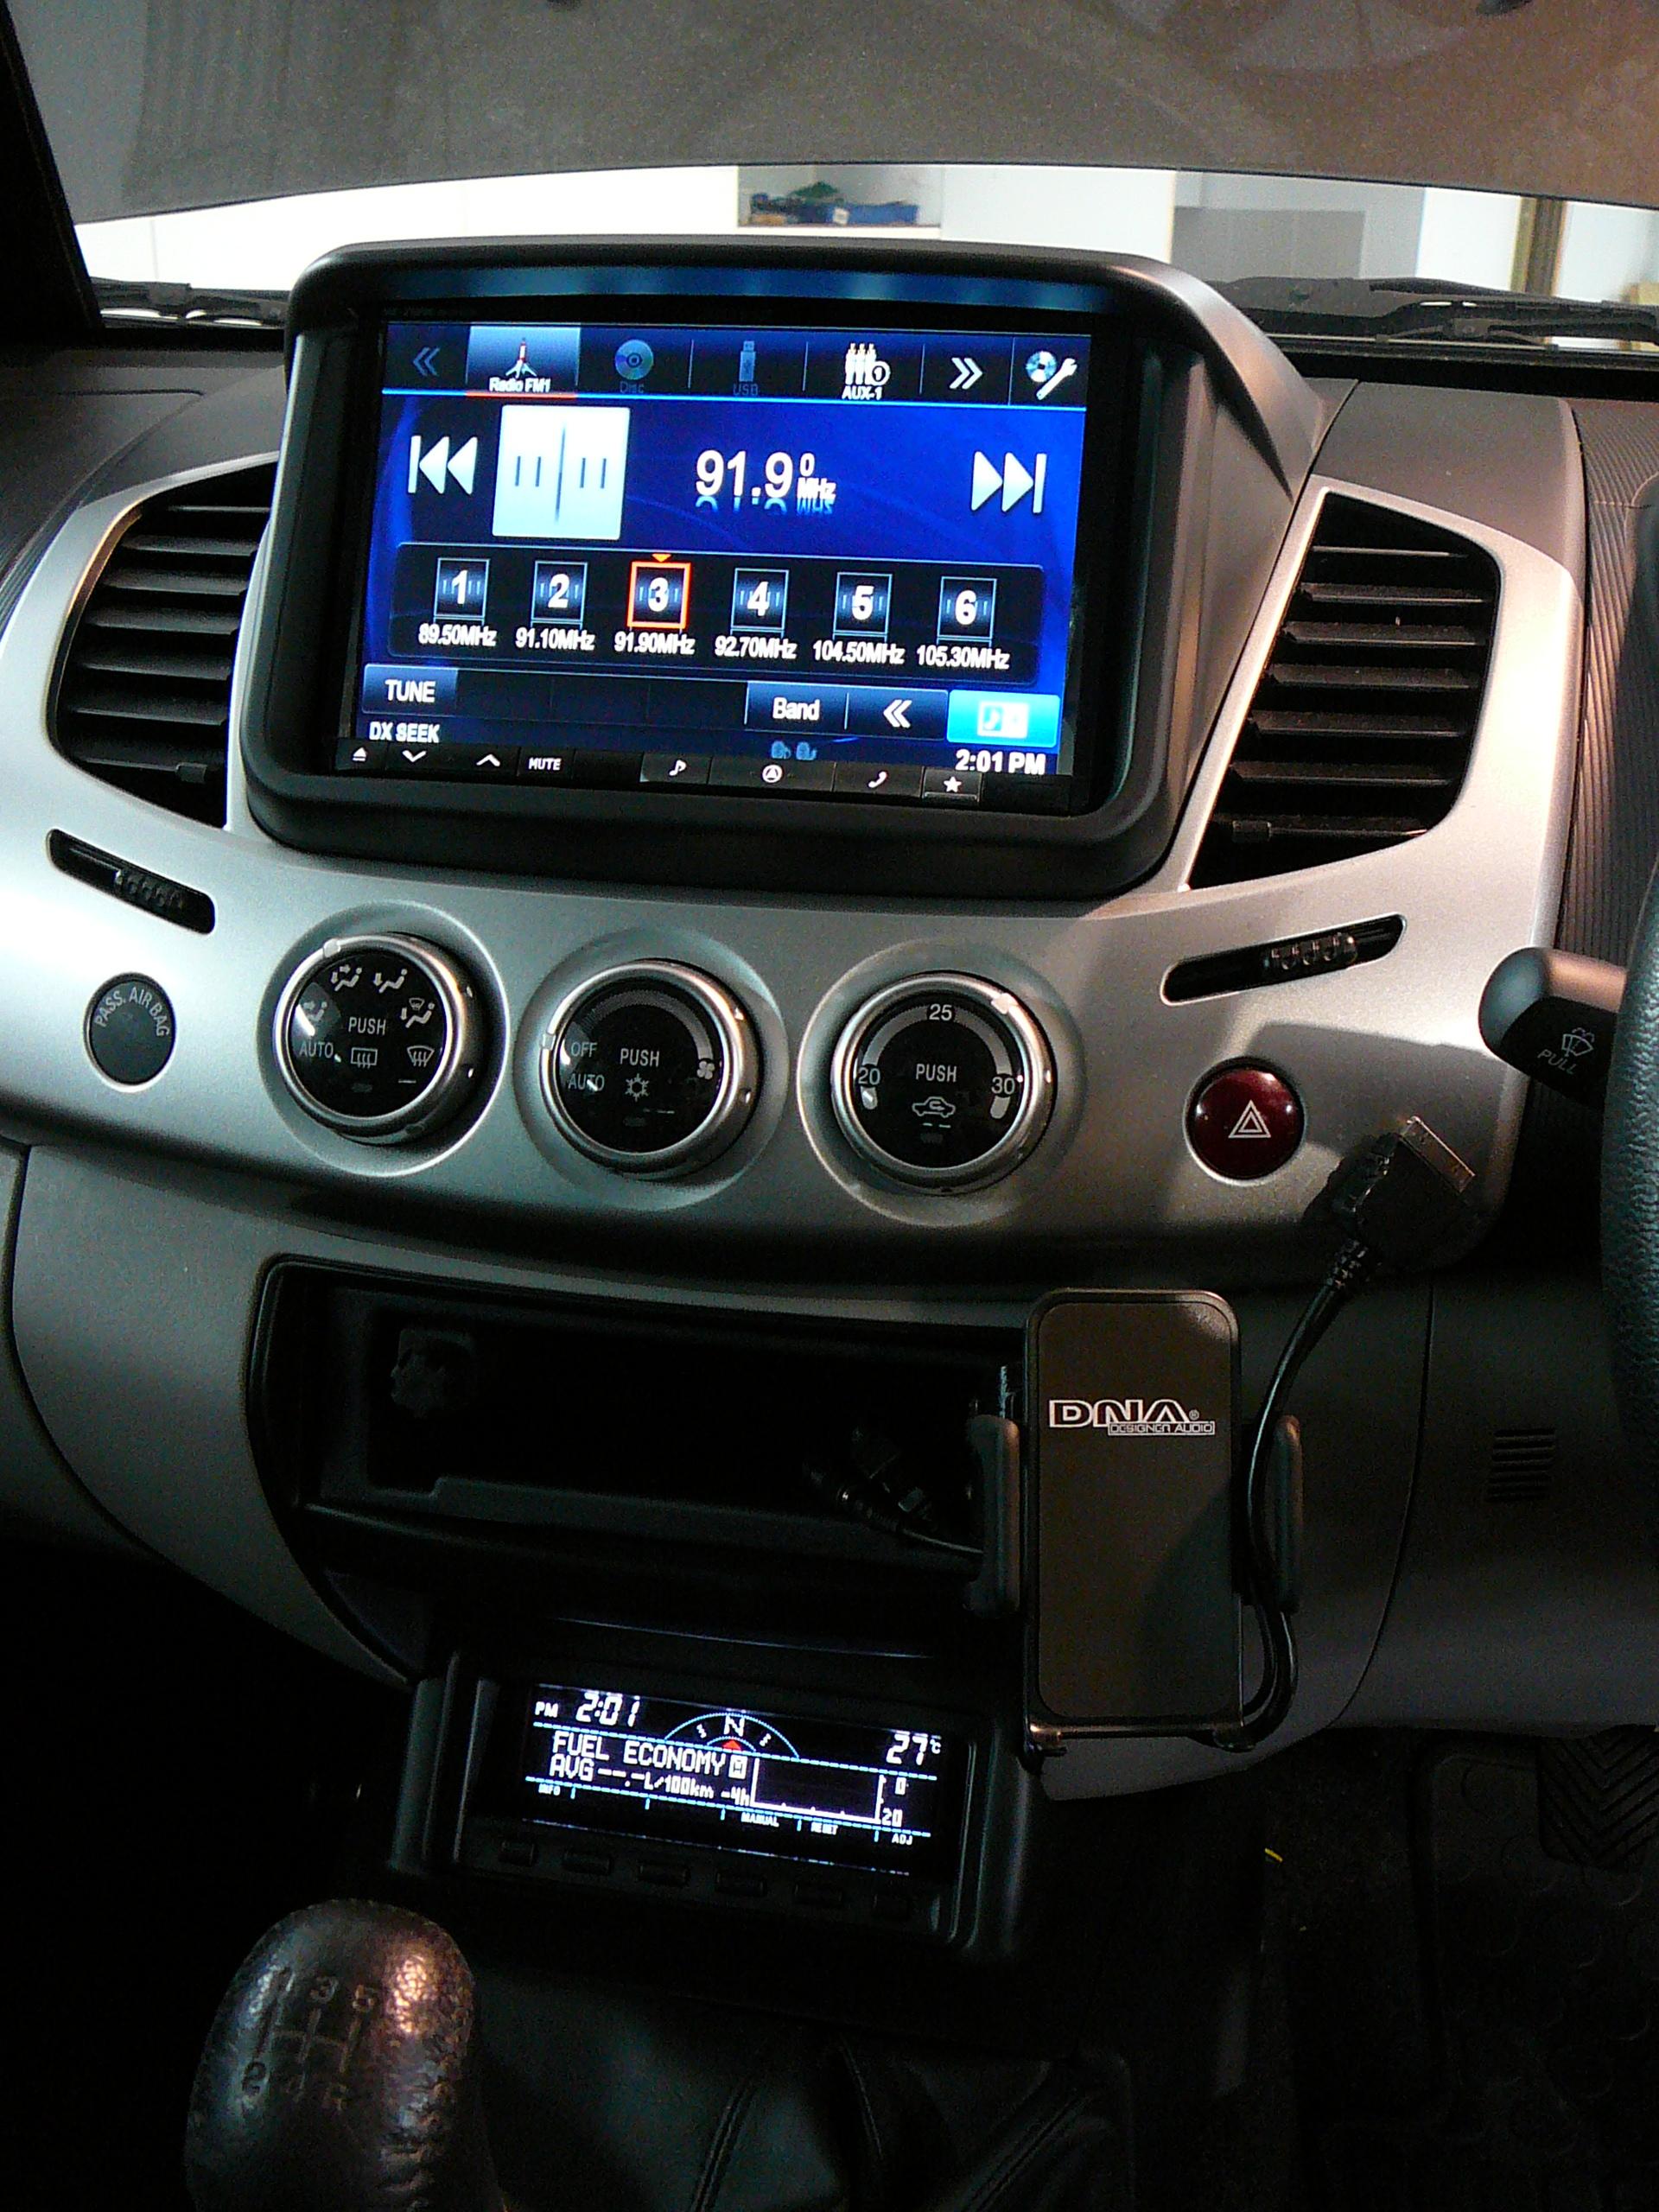 Mitsubishi Triton 2012, Custom Installation – Focal Utopia Kit No7